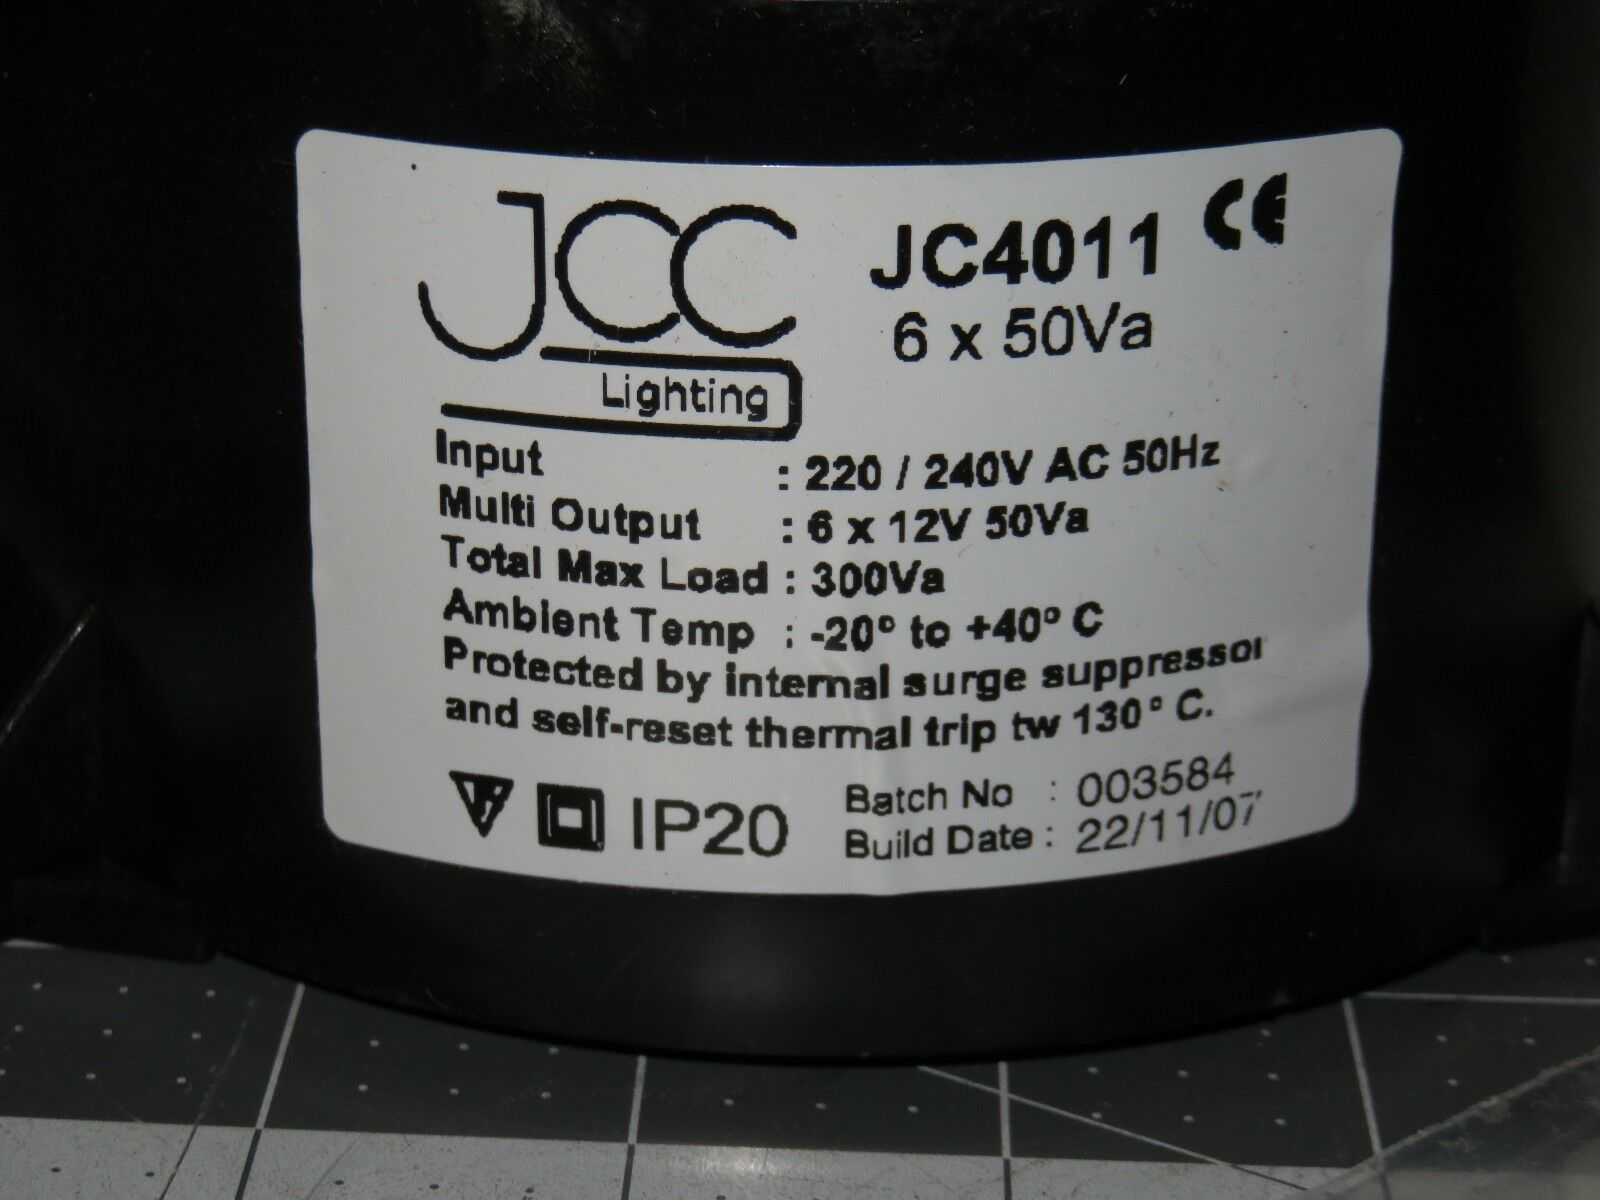 JCC Lighting JC4011 Toroidal Transformer Output 6 X 50va 220-240v AC ...